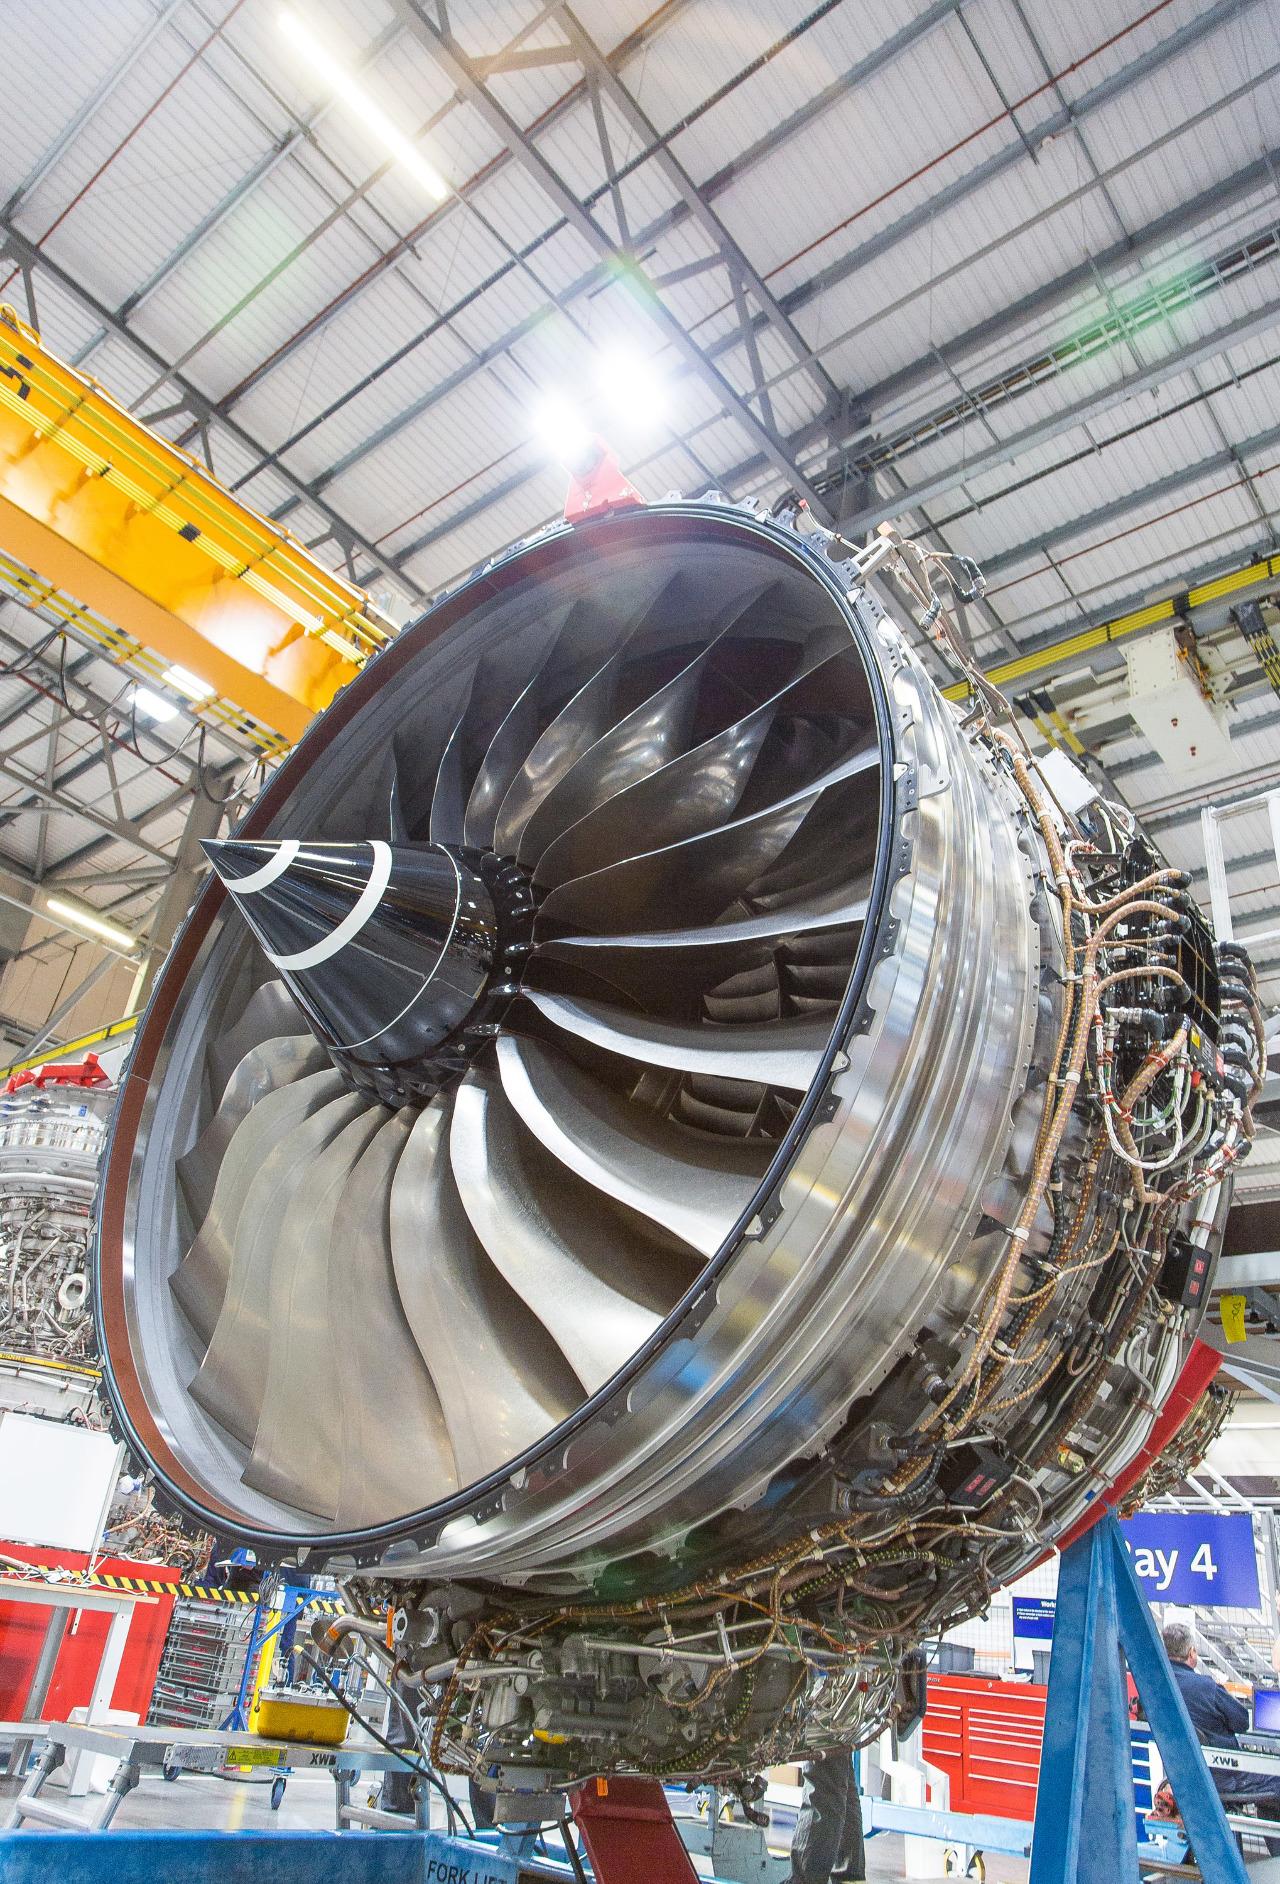 Farnborough 2016 : le Rolls-Royce Trent 1000 Ten certifié AESA